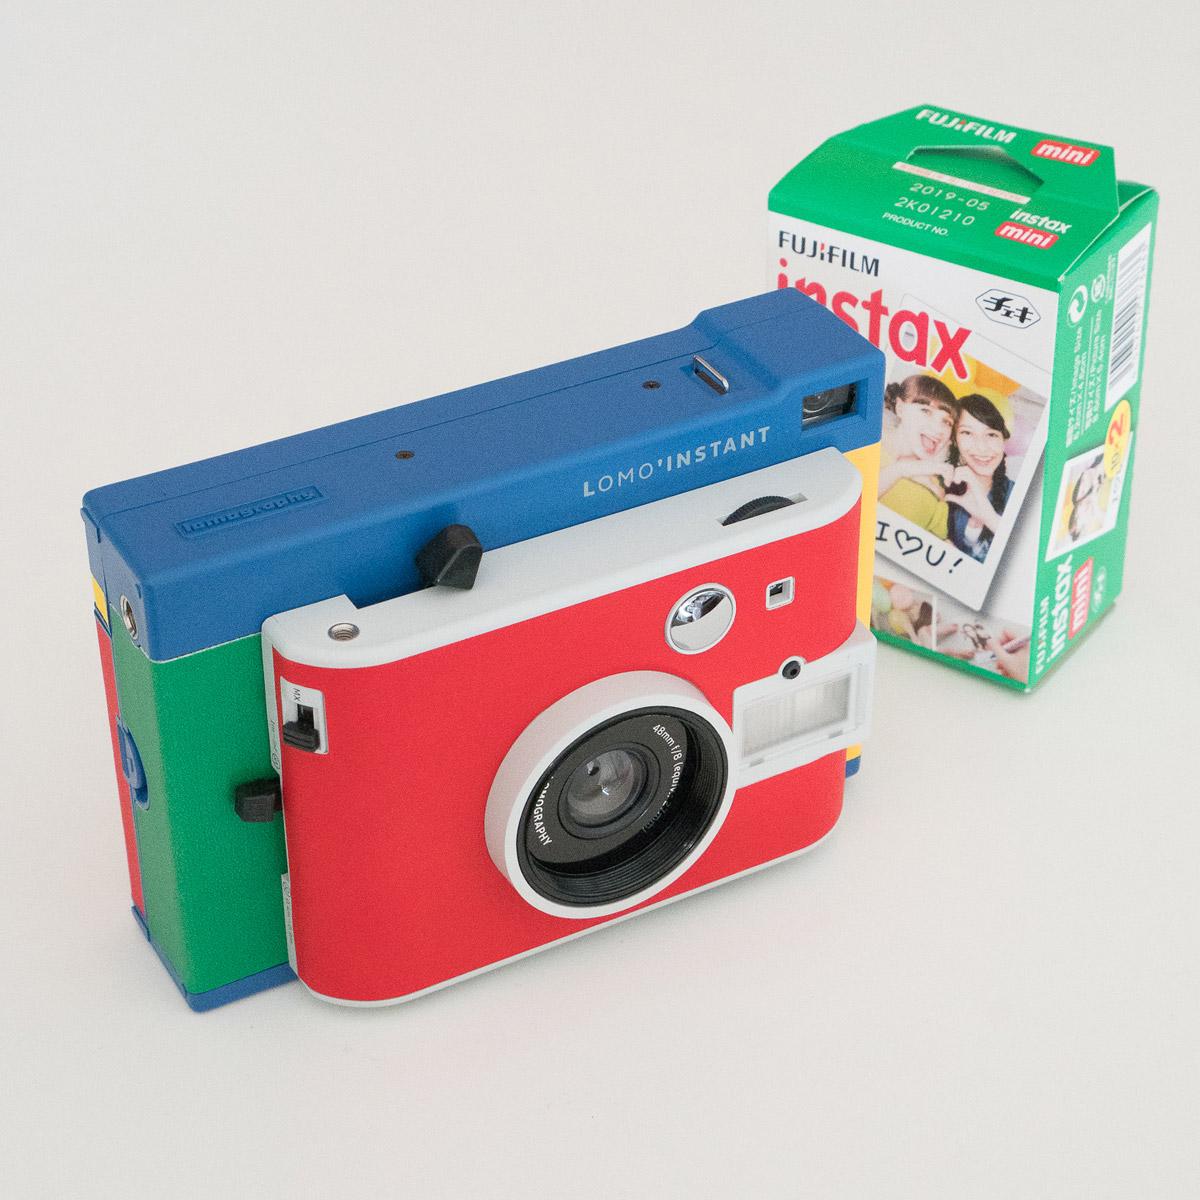 Lomo'Instant Camera and film